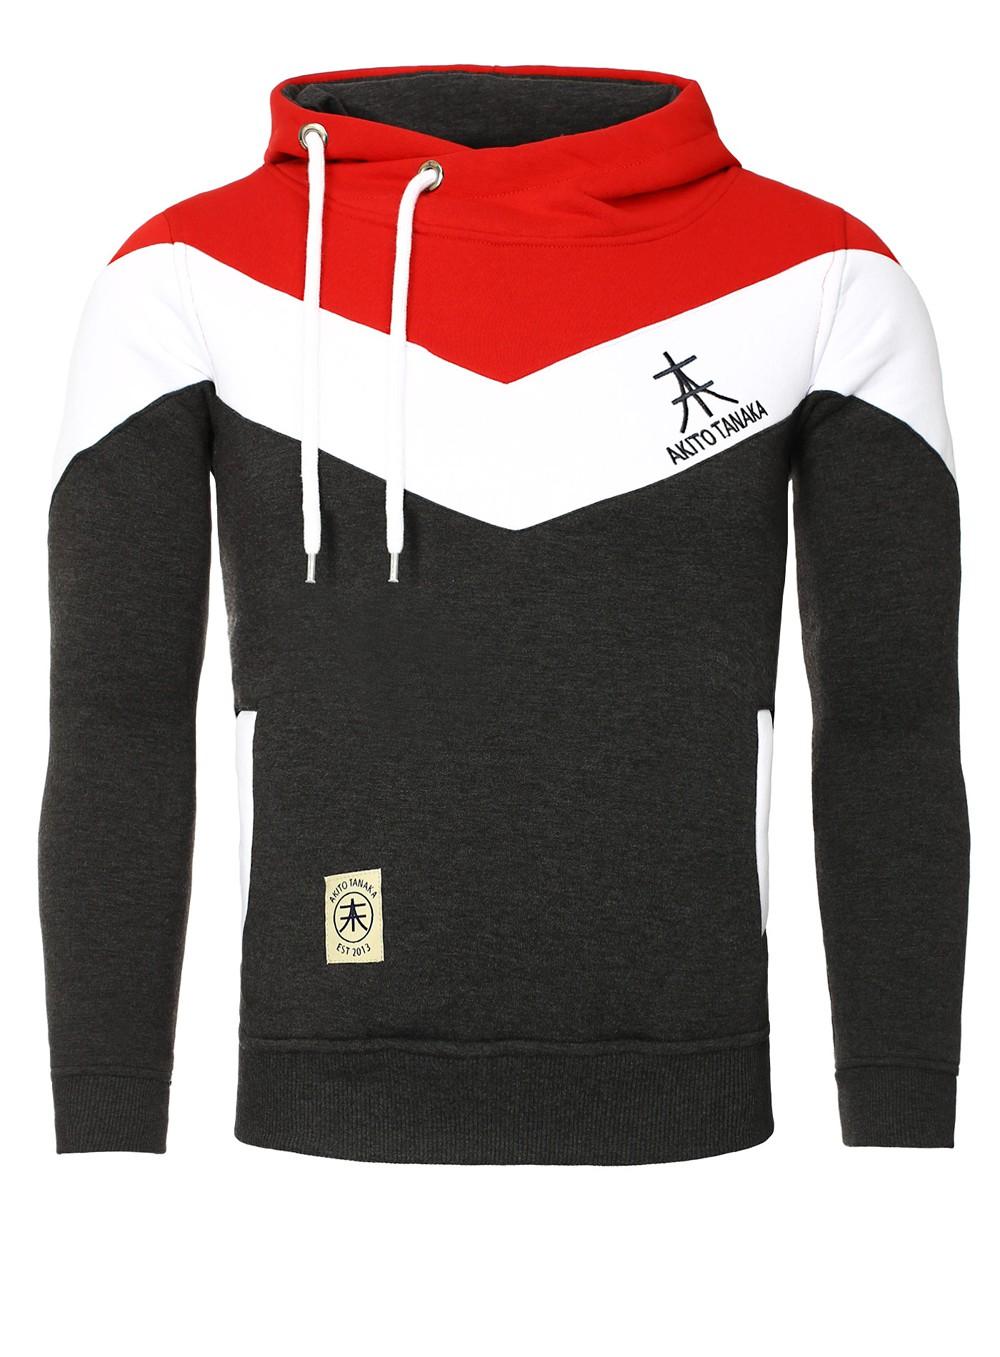 akito tanaka herren sweatshirt 18144 sweater pullover. Black Bedroom Furniture Sets. Home Design Ideas